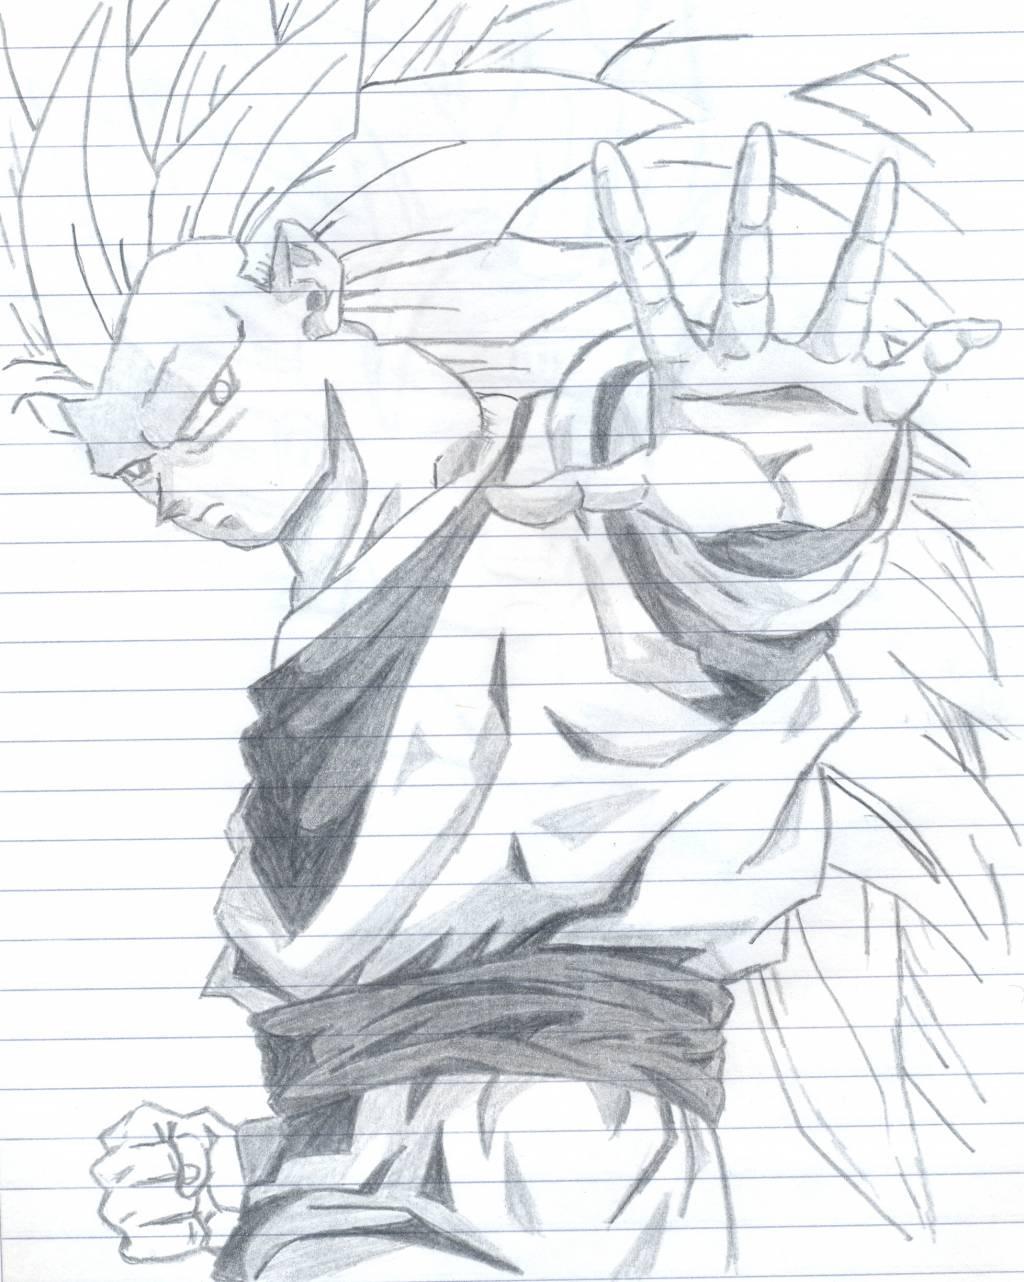 Dibujo de goku en lapiz - Imagui